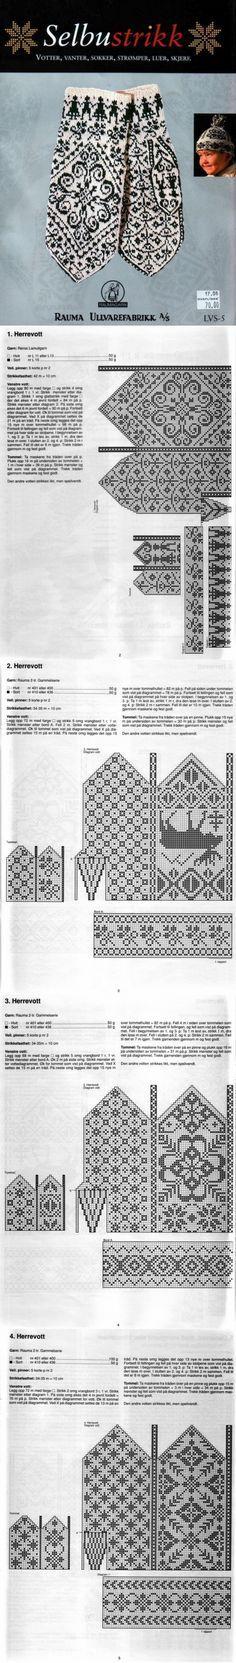 вязание   Strikking   Pinterest   Manopla, Mitones y Textiles